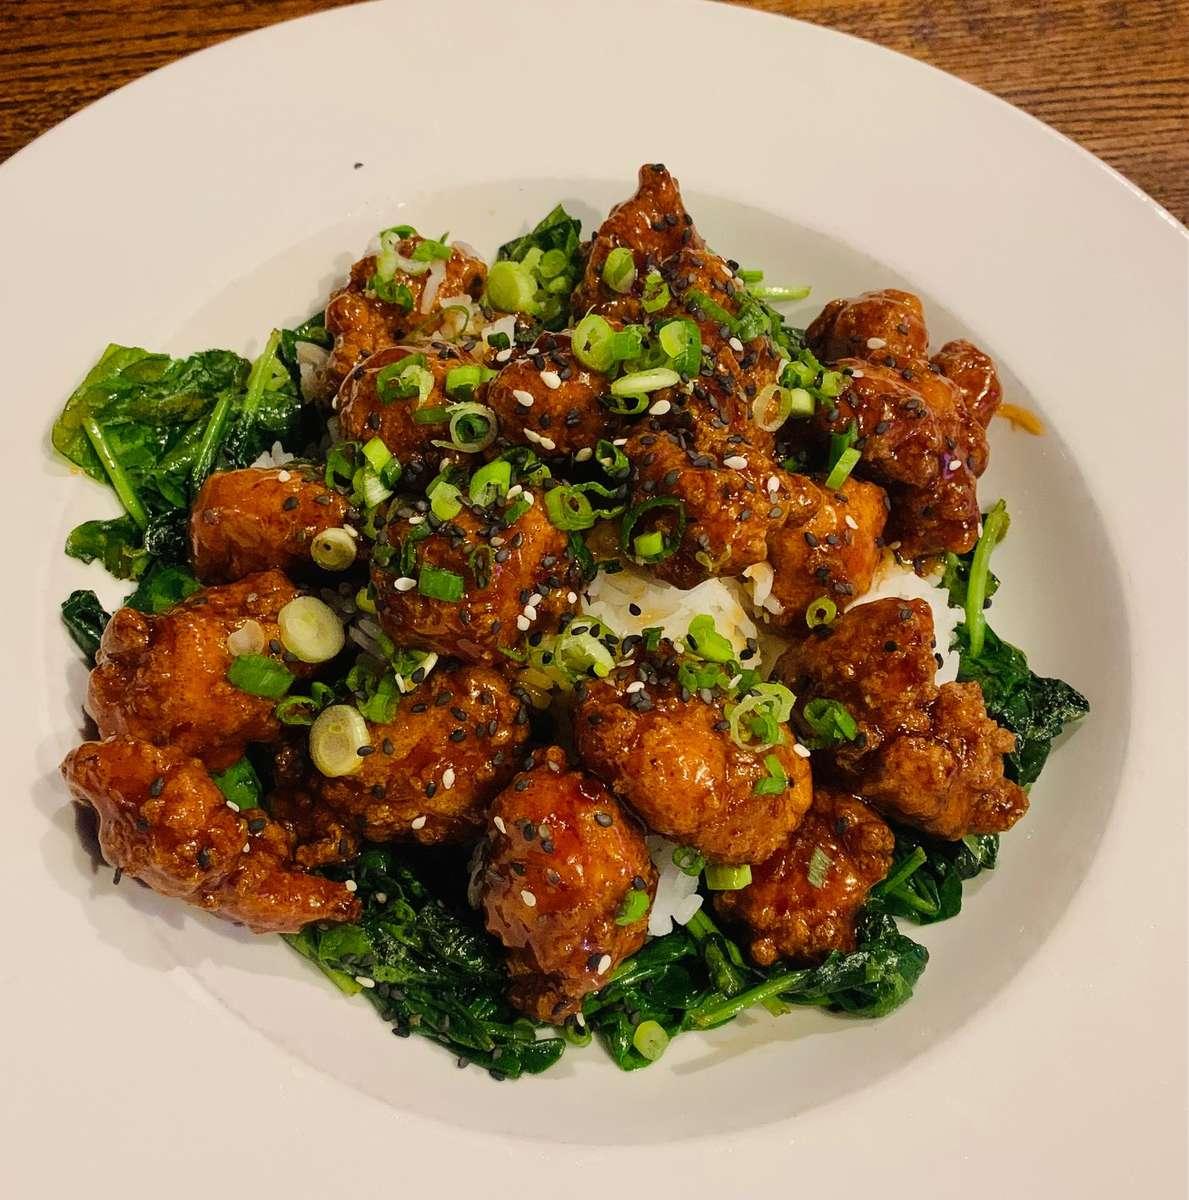 Tso's Rice Bowl